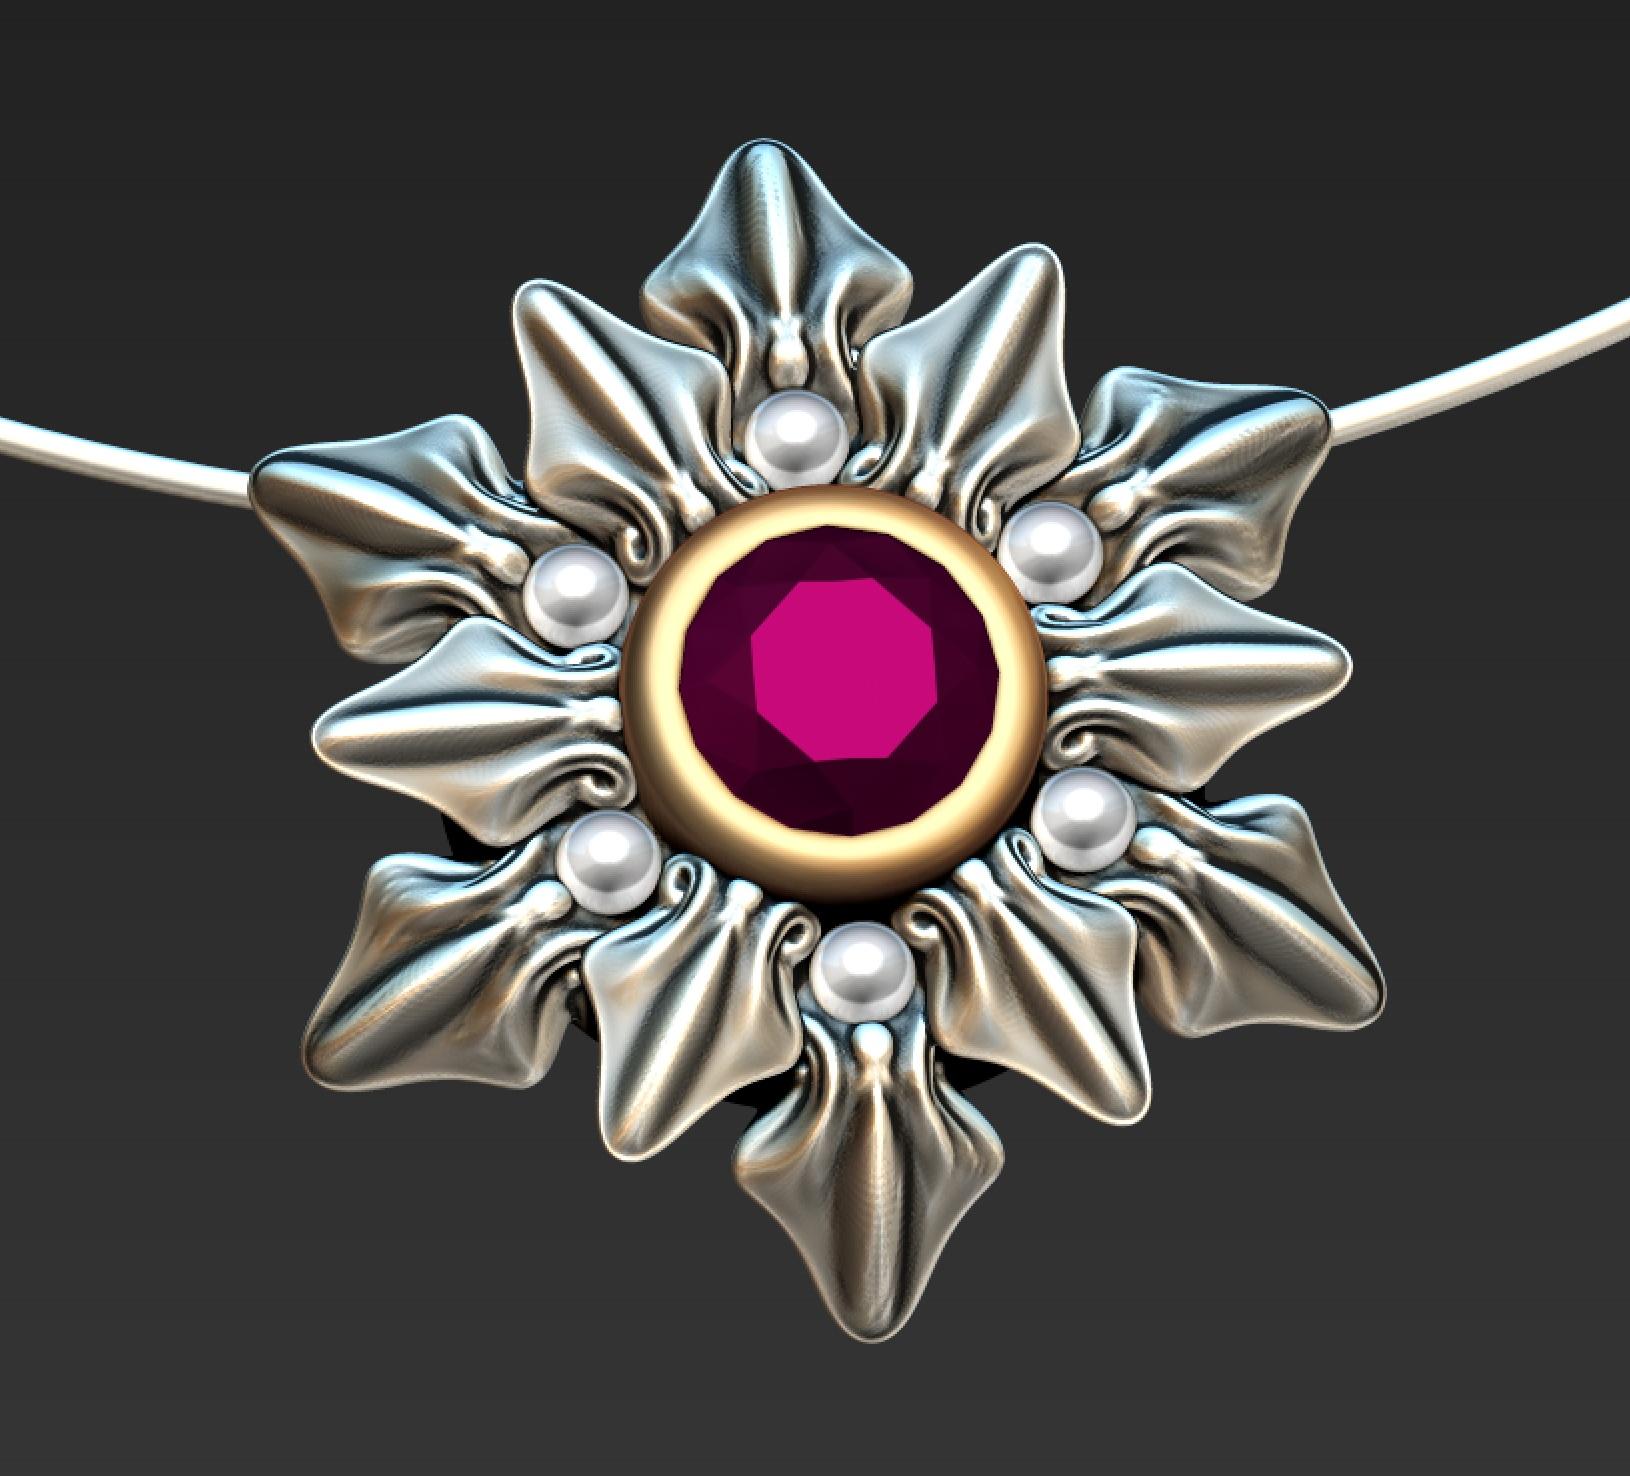 kat-adair-kramer-zbrush-jewelry-vdm-brush.jpg